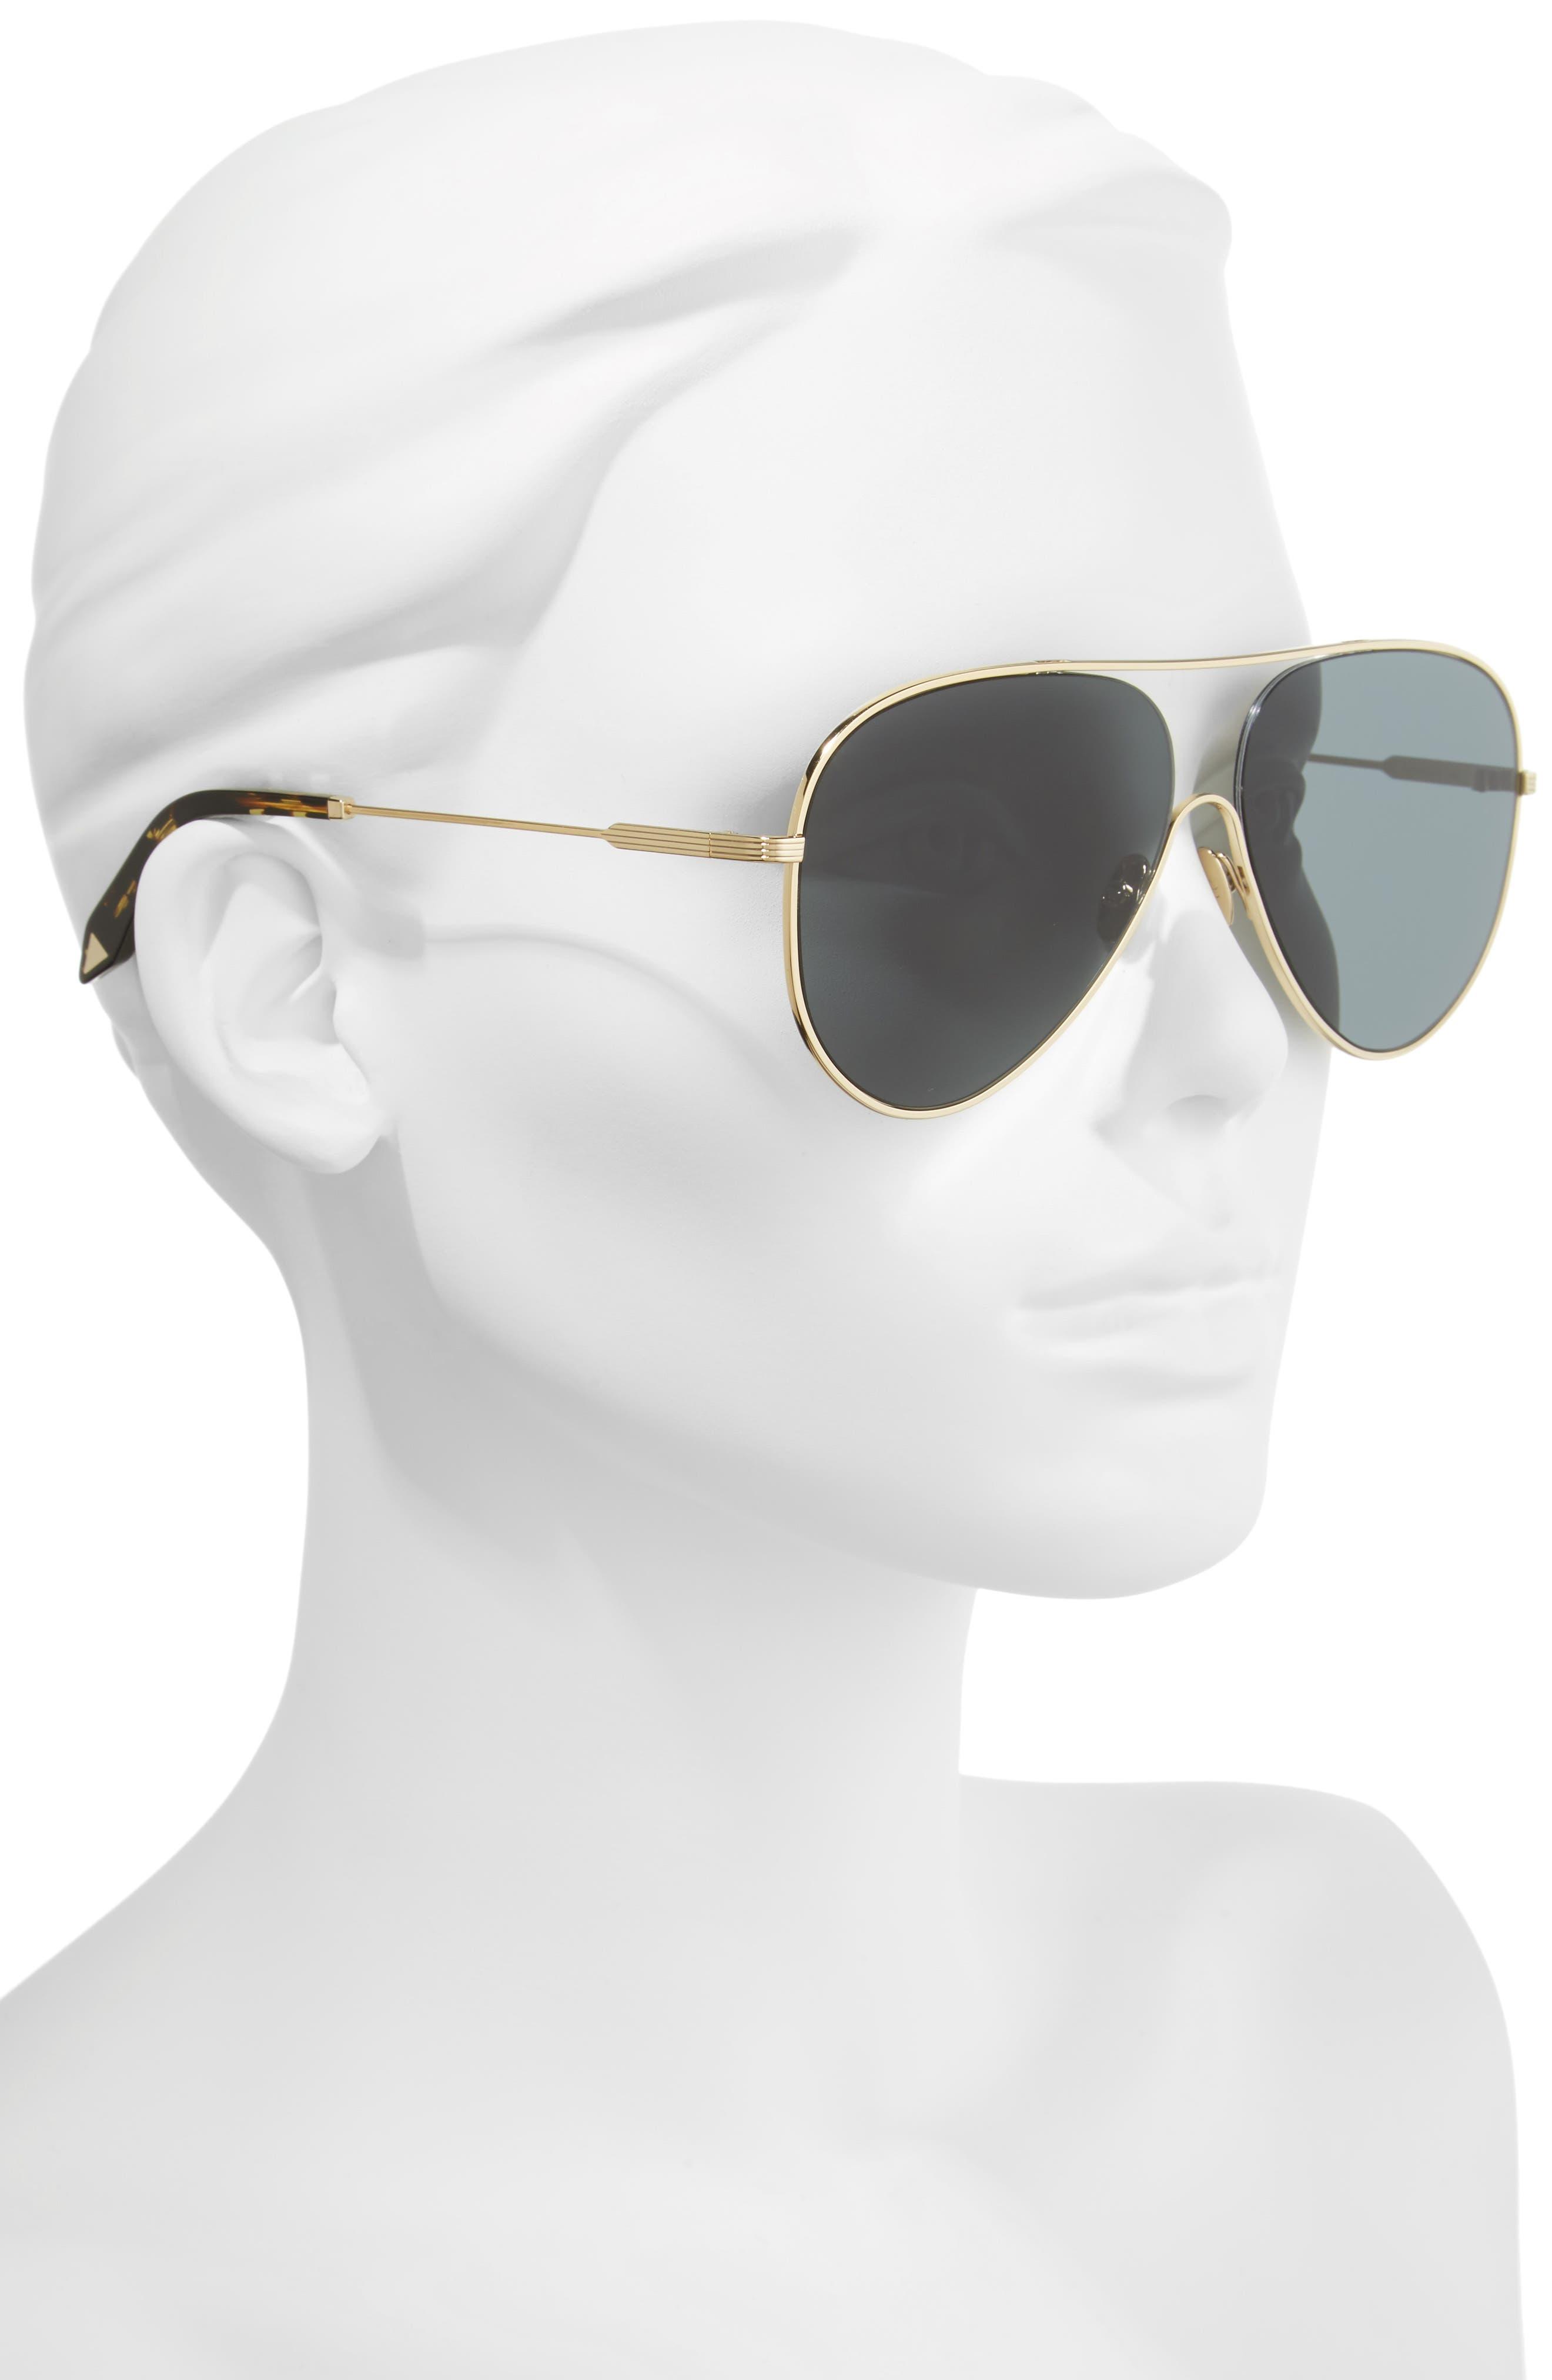 VICTORIA BECKHAM, Loop 62mm Oversize Aviator Sunglasses, Alternate thumbnail 2, color, 020